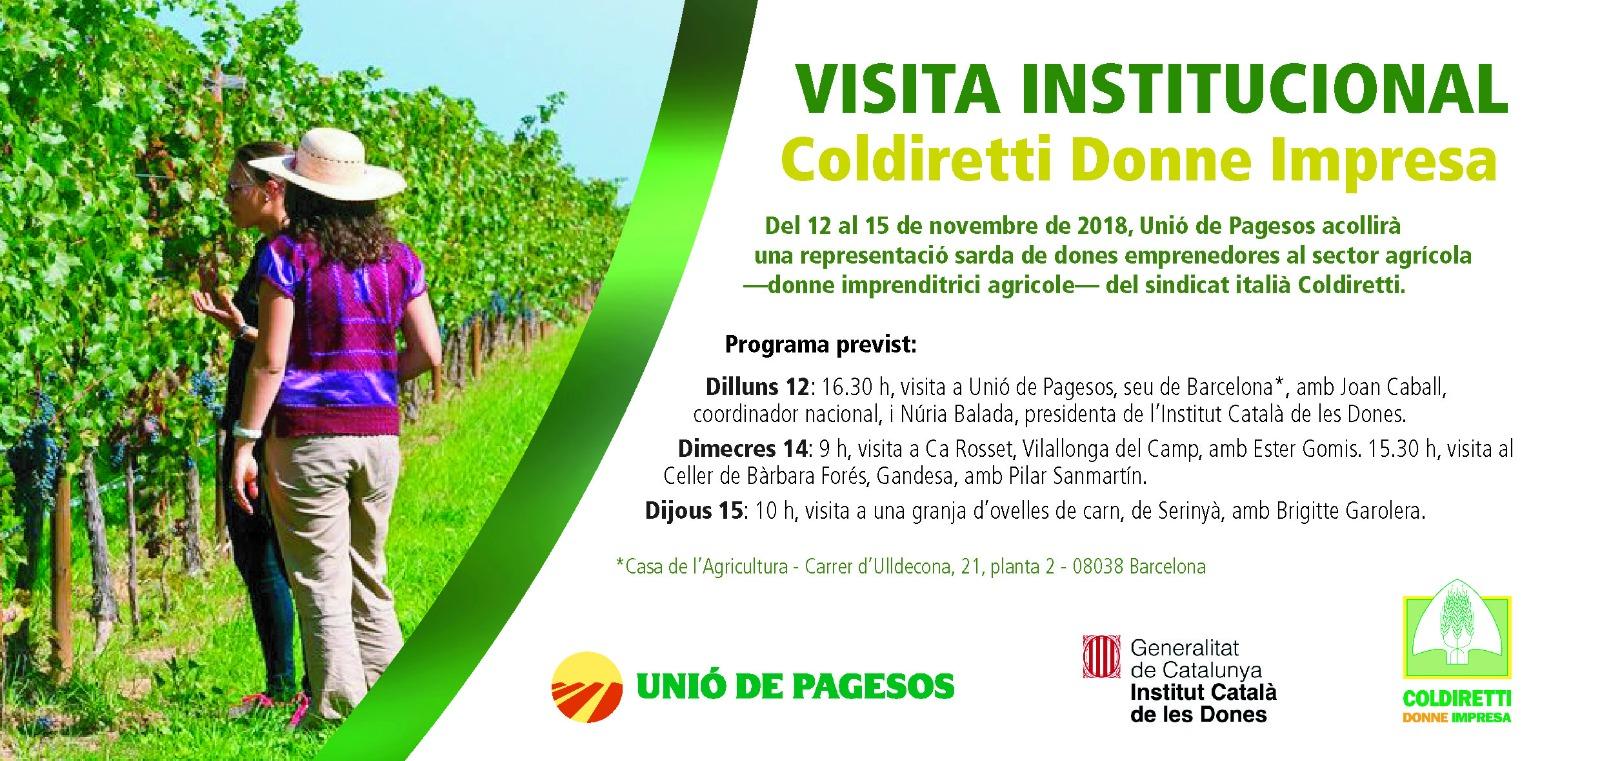 Visita Institucional – Coldiretti Donne Impresa